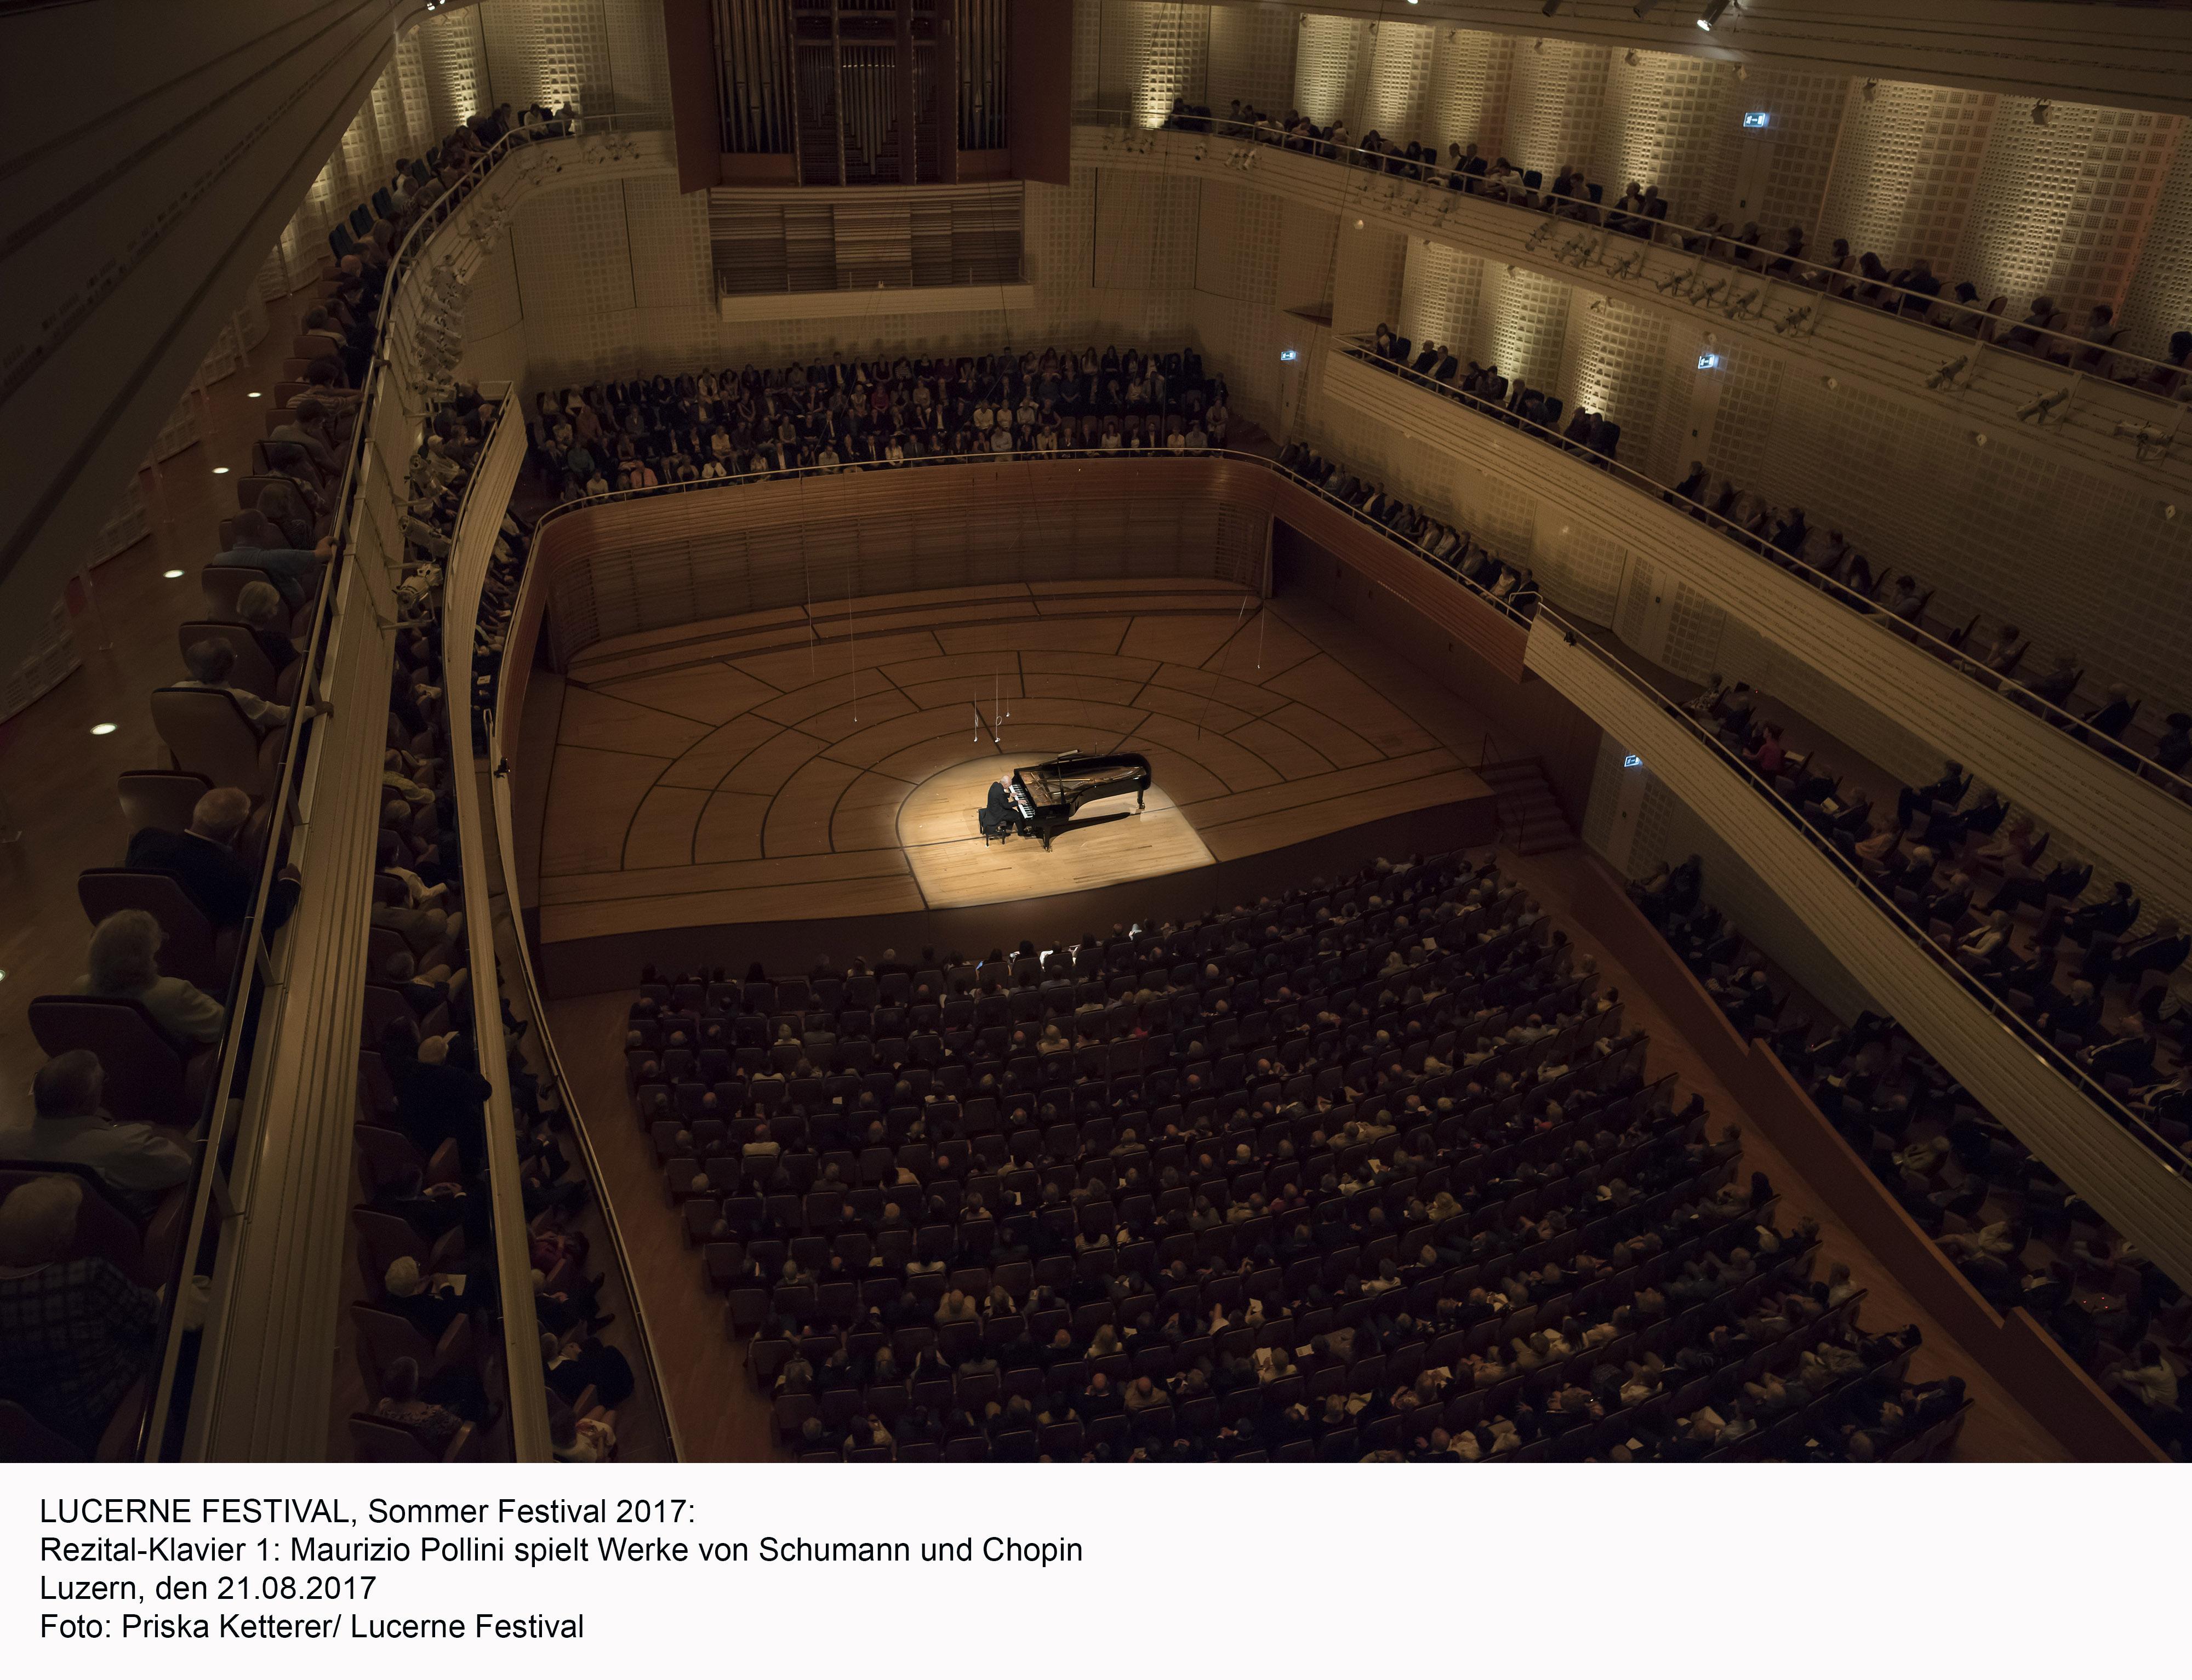 Lucerne festival - piano-festival